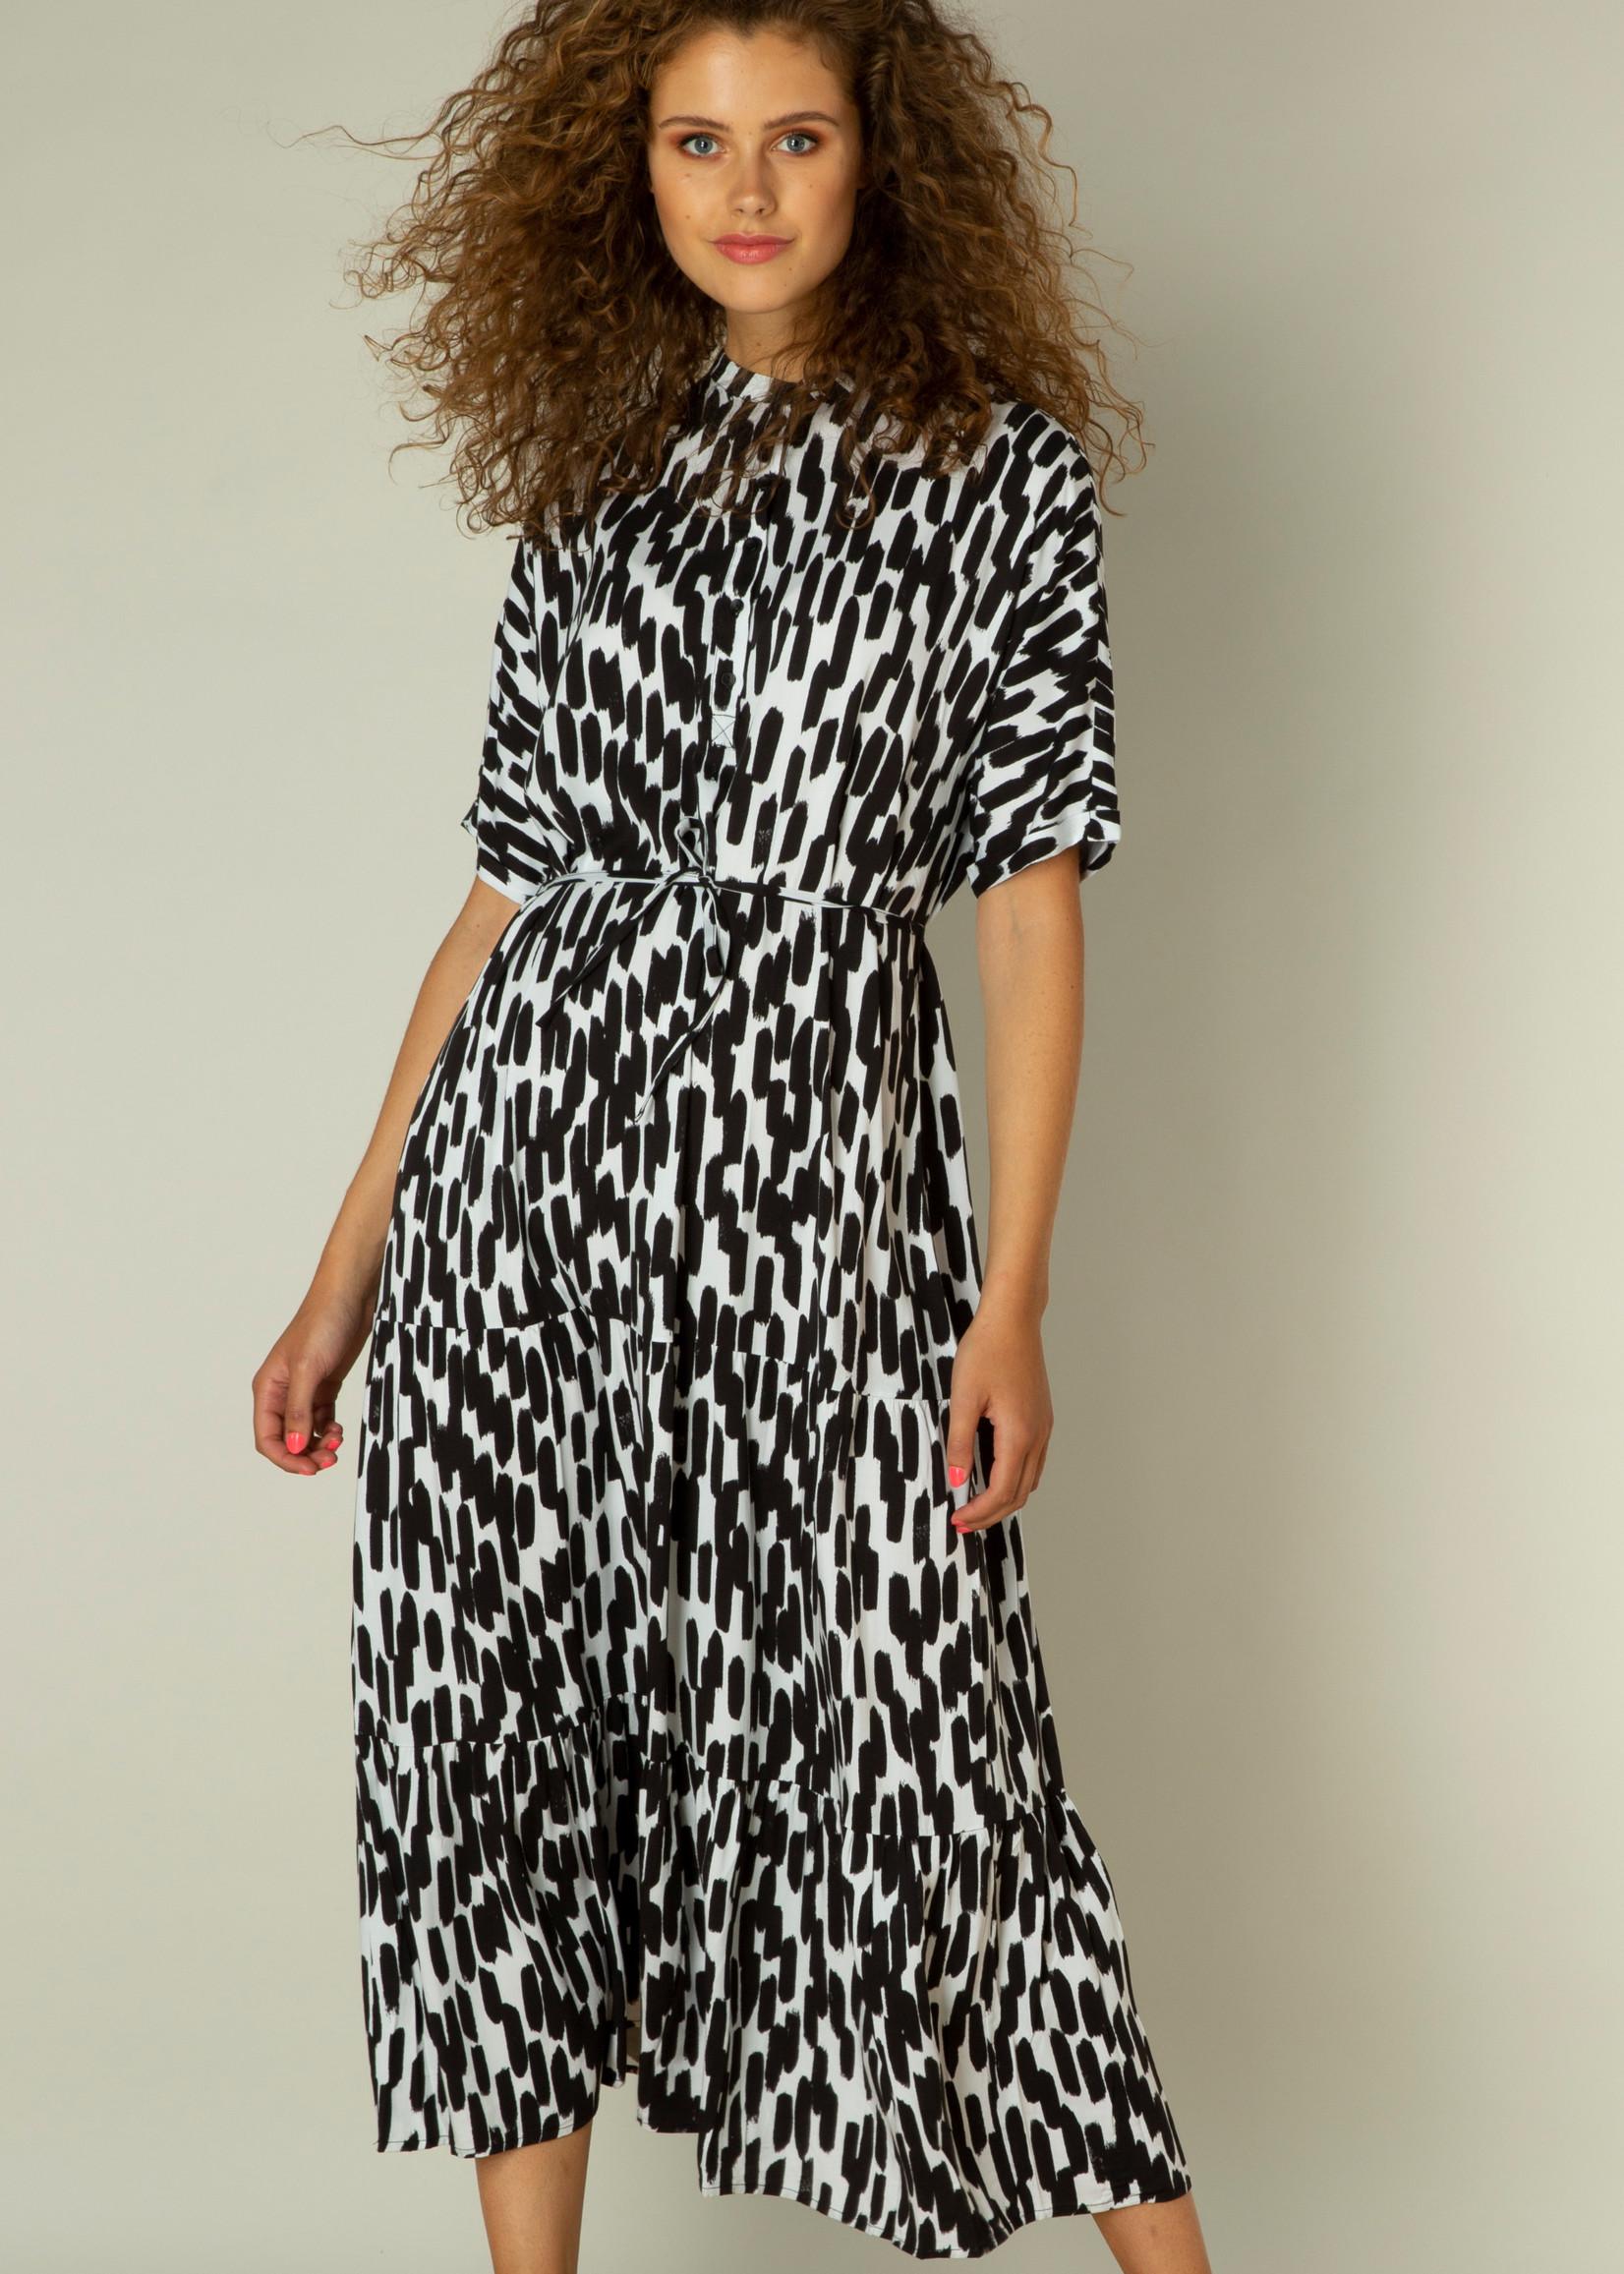 Yest Yest Immy Dress